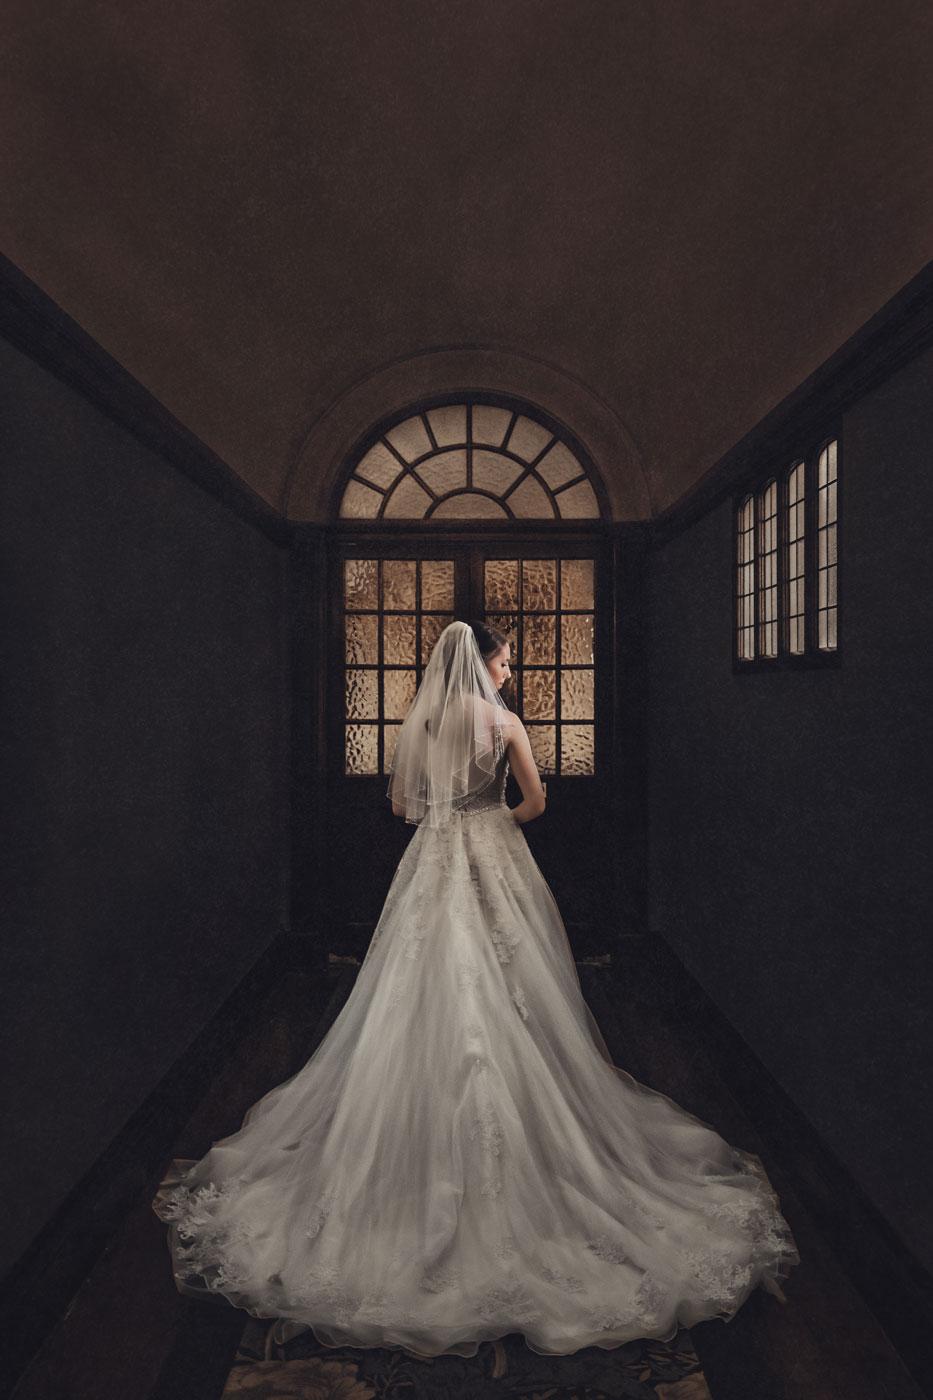 Fine art wedding photography at Eynsham Hall